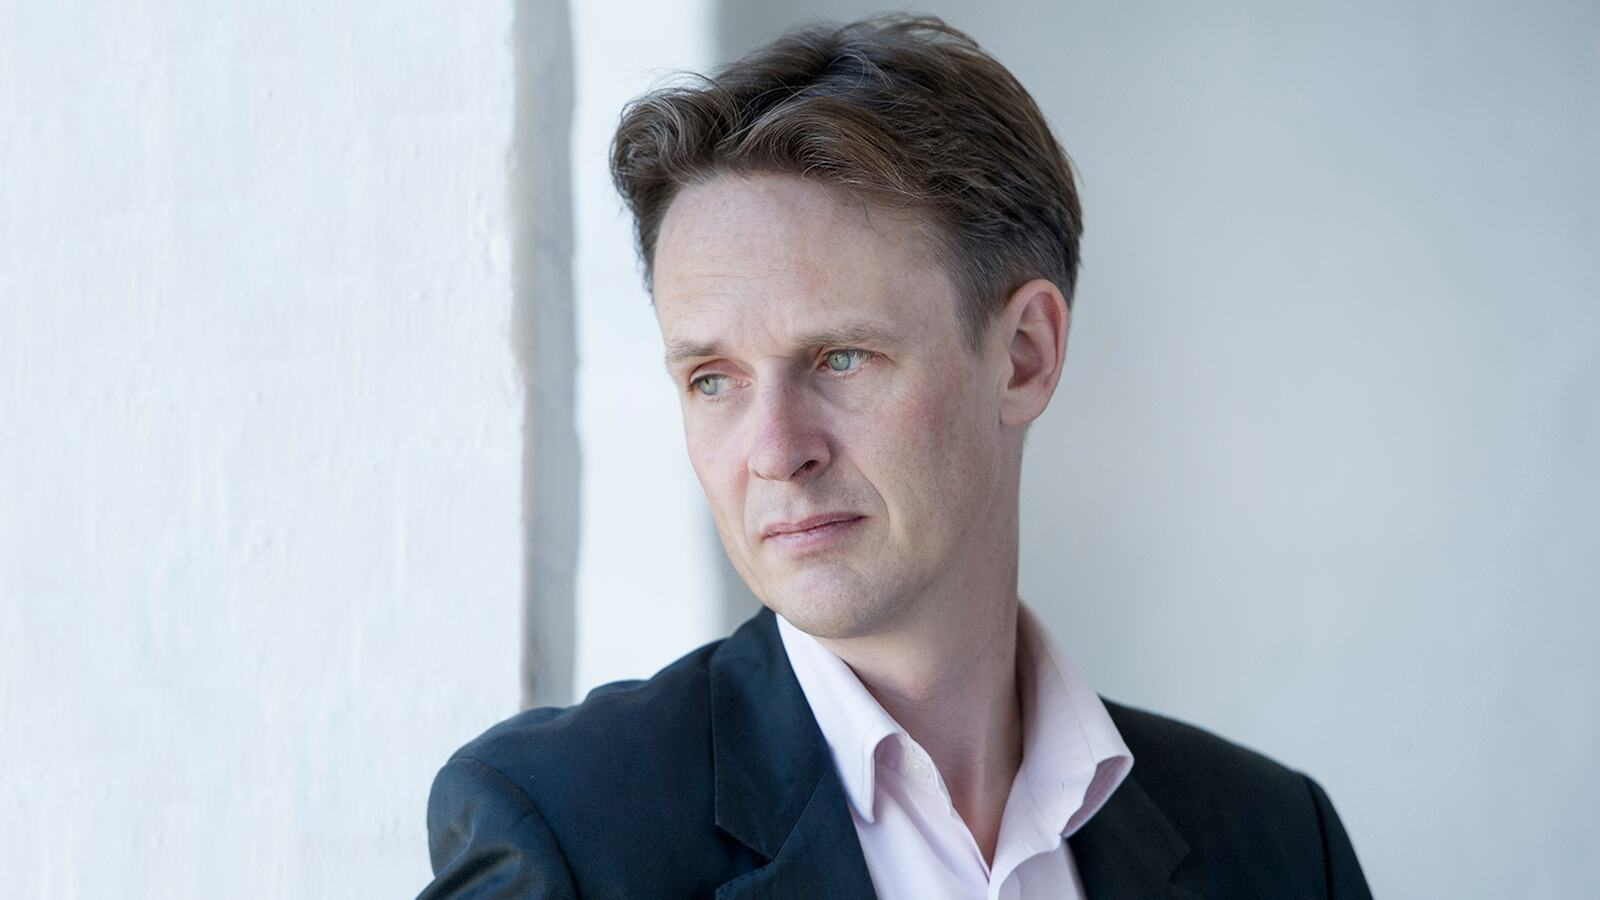 Ian Bostridge, tenor